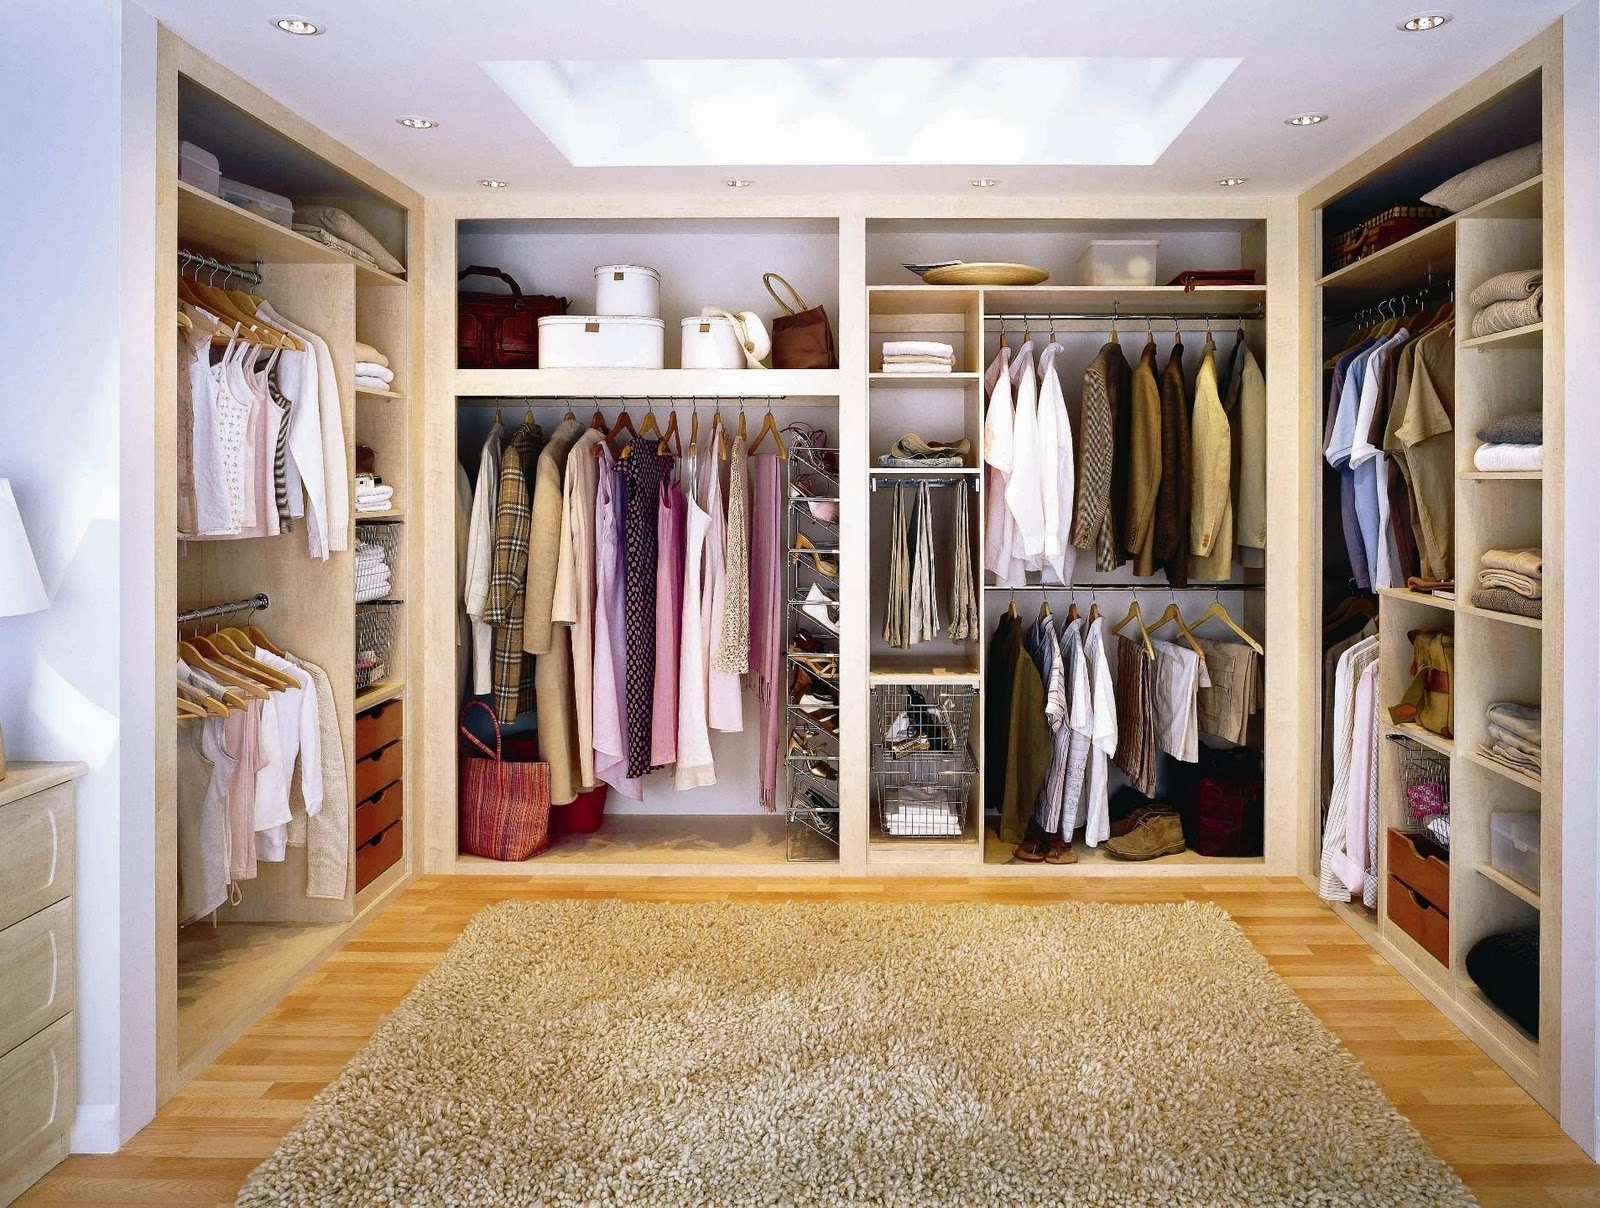 Фото гардеробных комнат своими руками